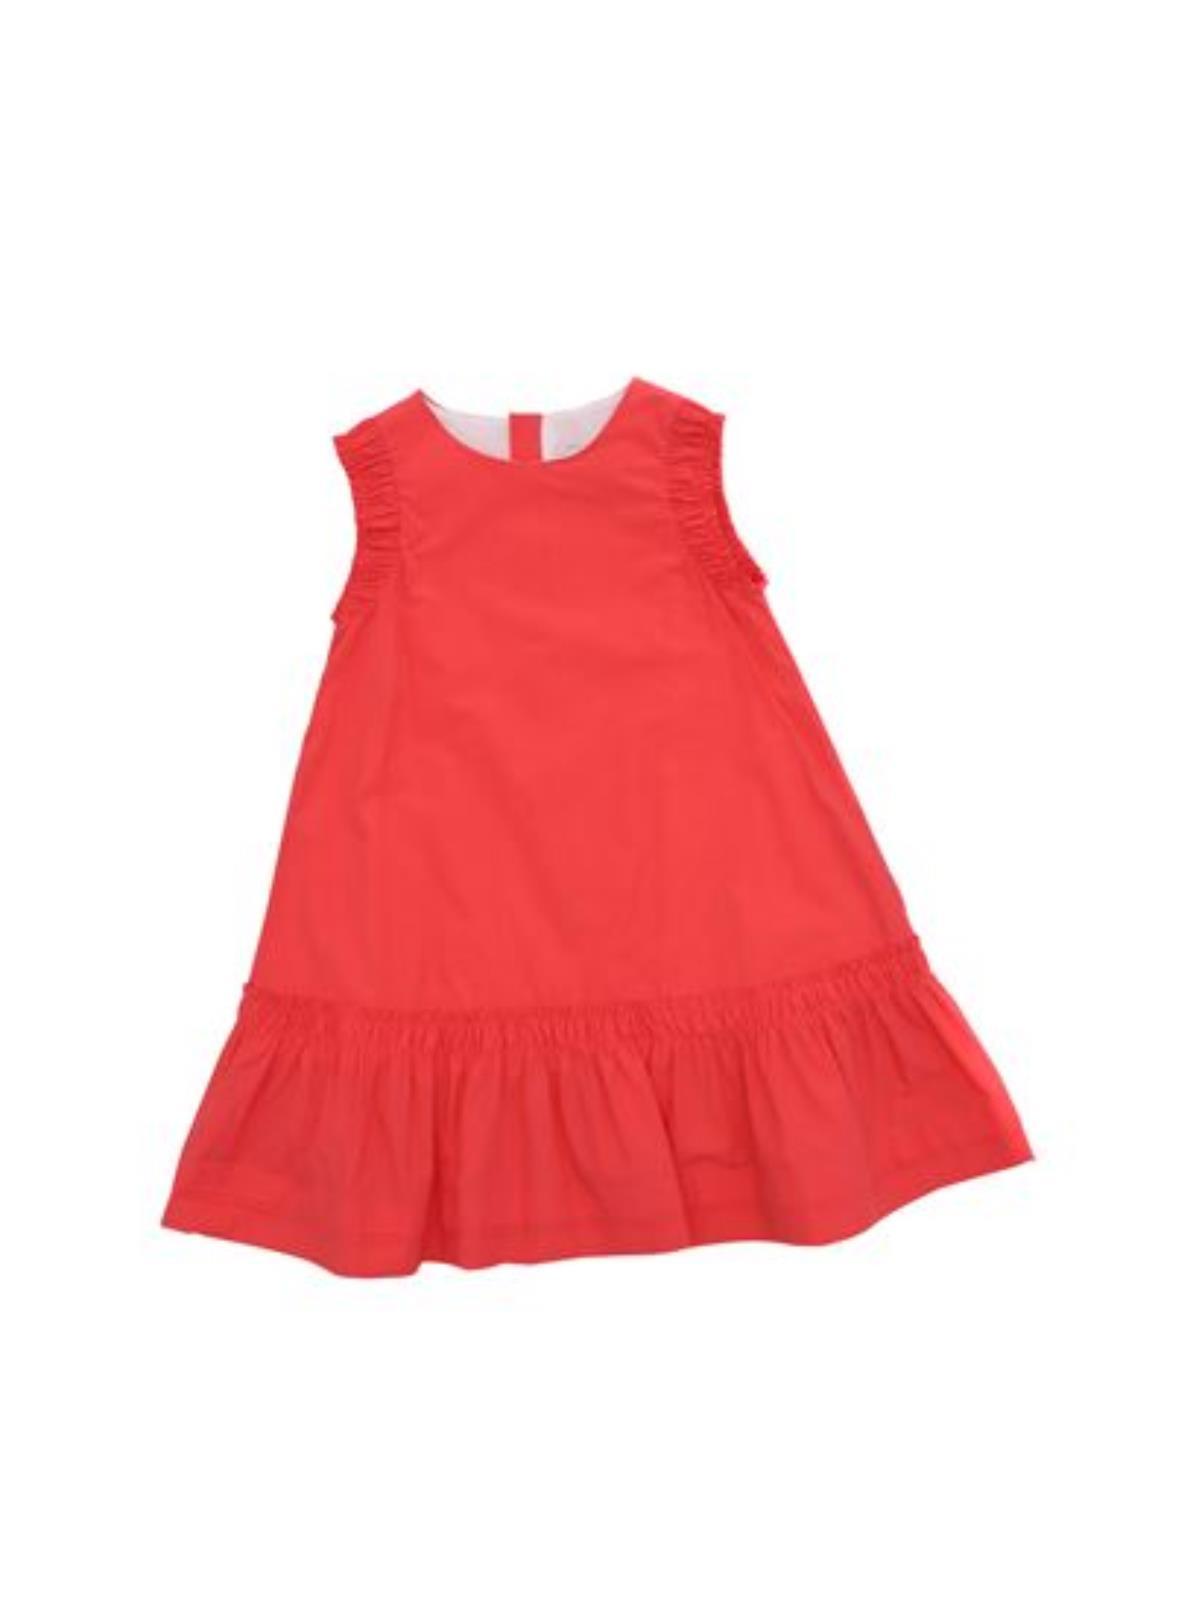 competitive price d8ba1 6f371 Moncler kids, abito smanicato